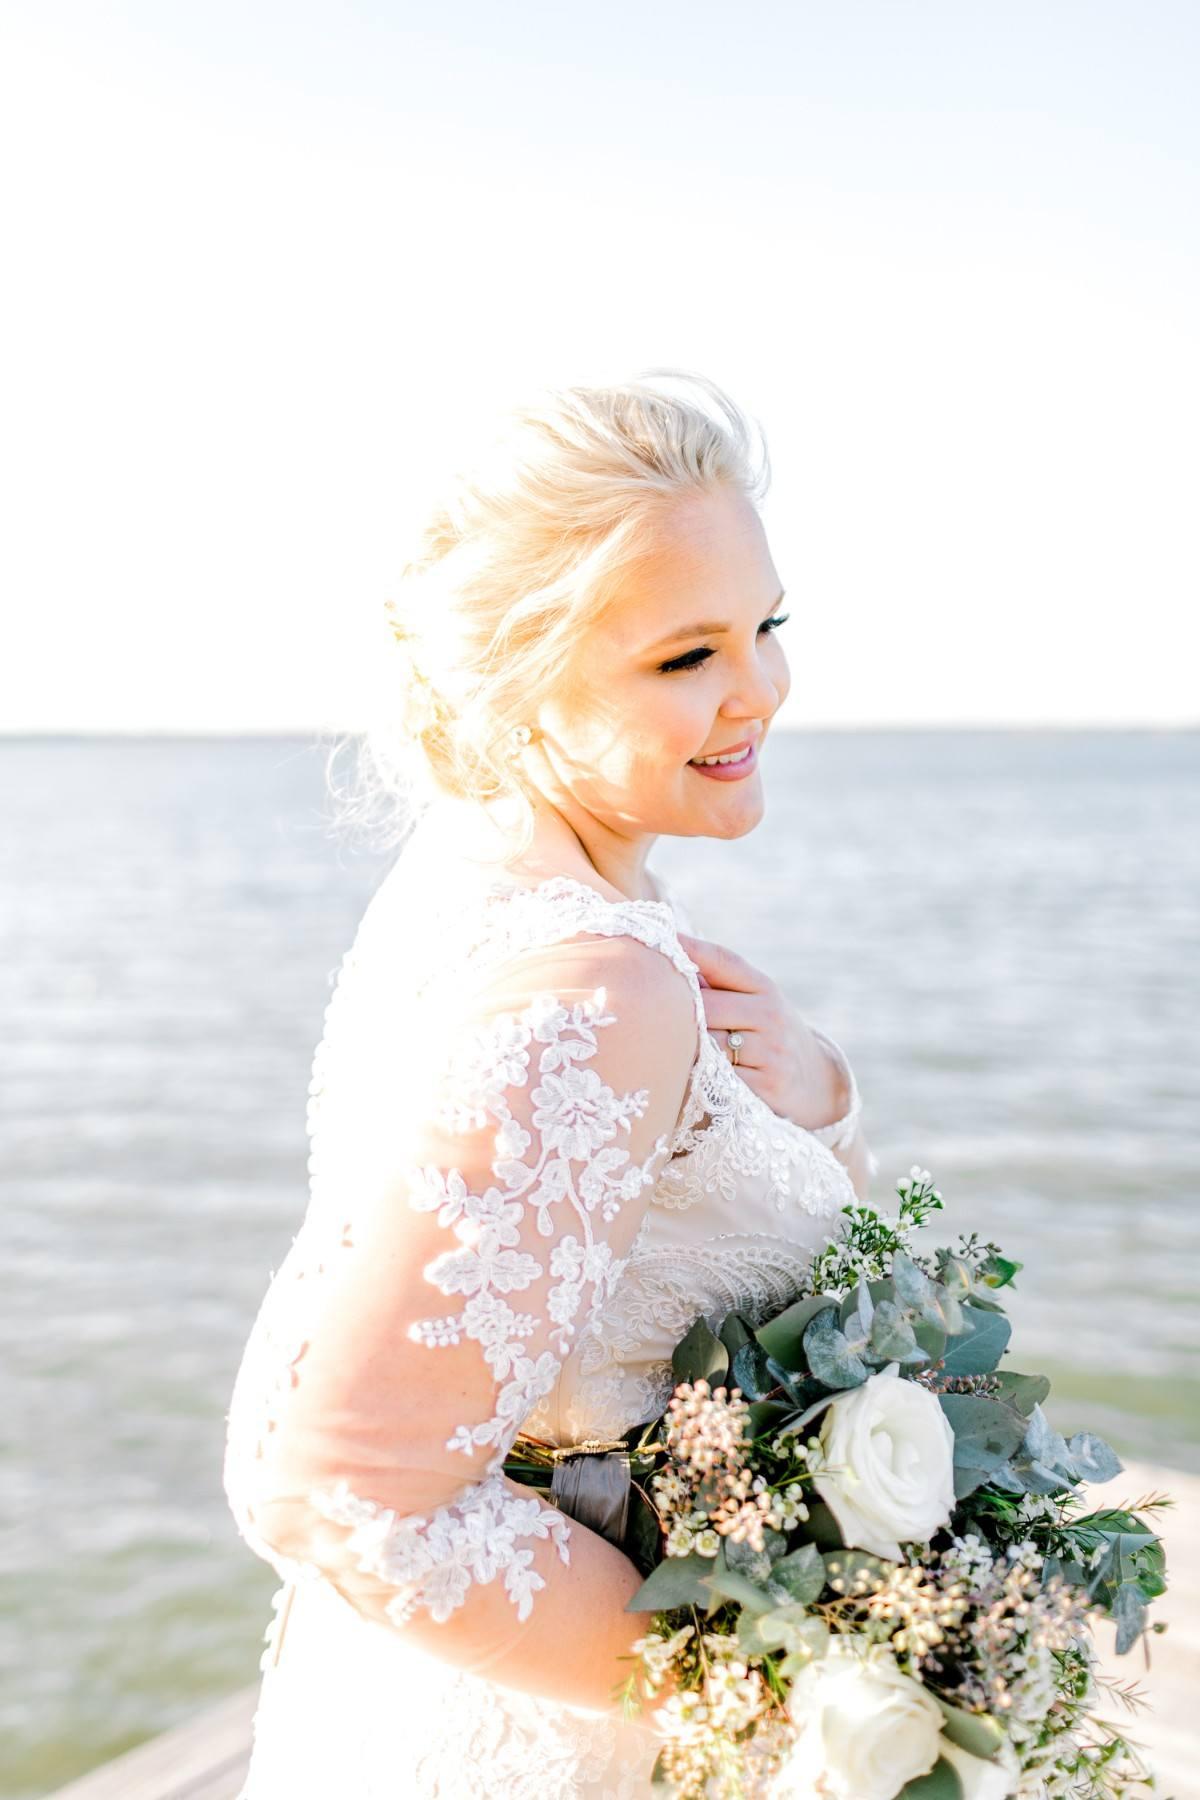 casidy-bridals-tradinghouse-lake-waco-wedding-photographer-kaitlyn-bullard-14.jpg